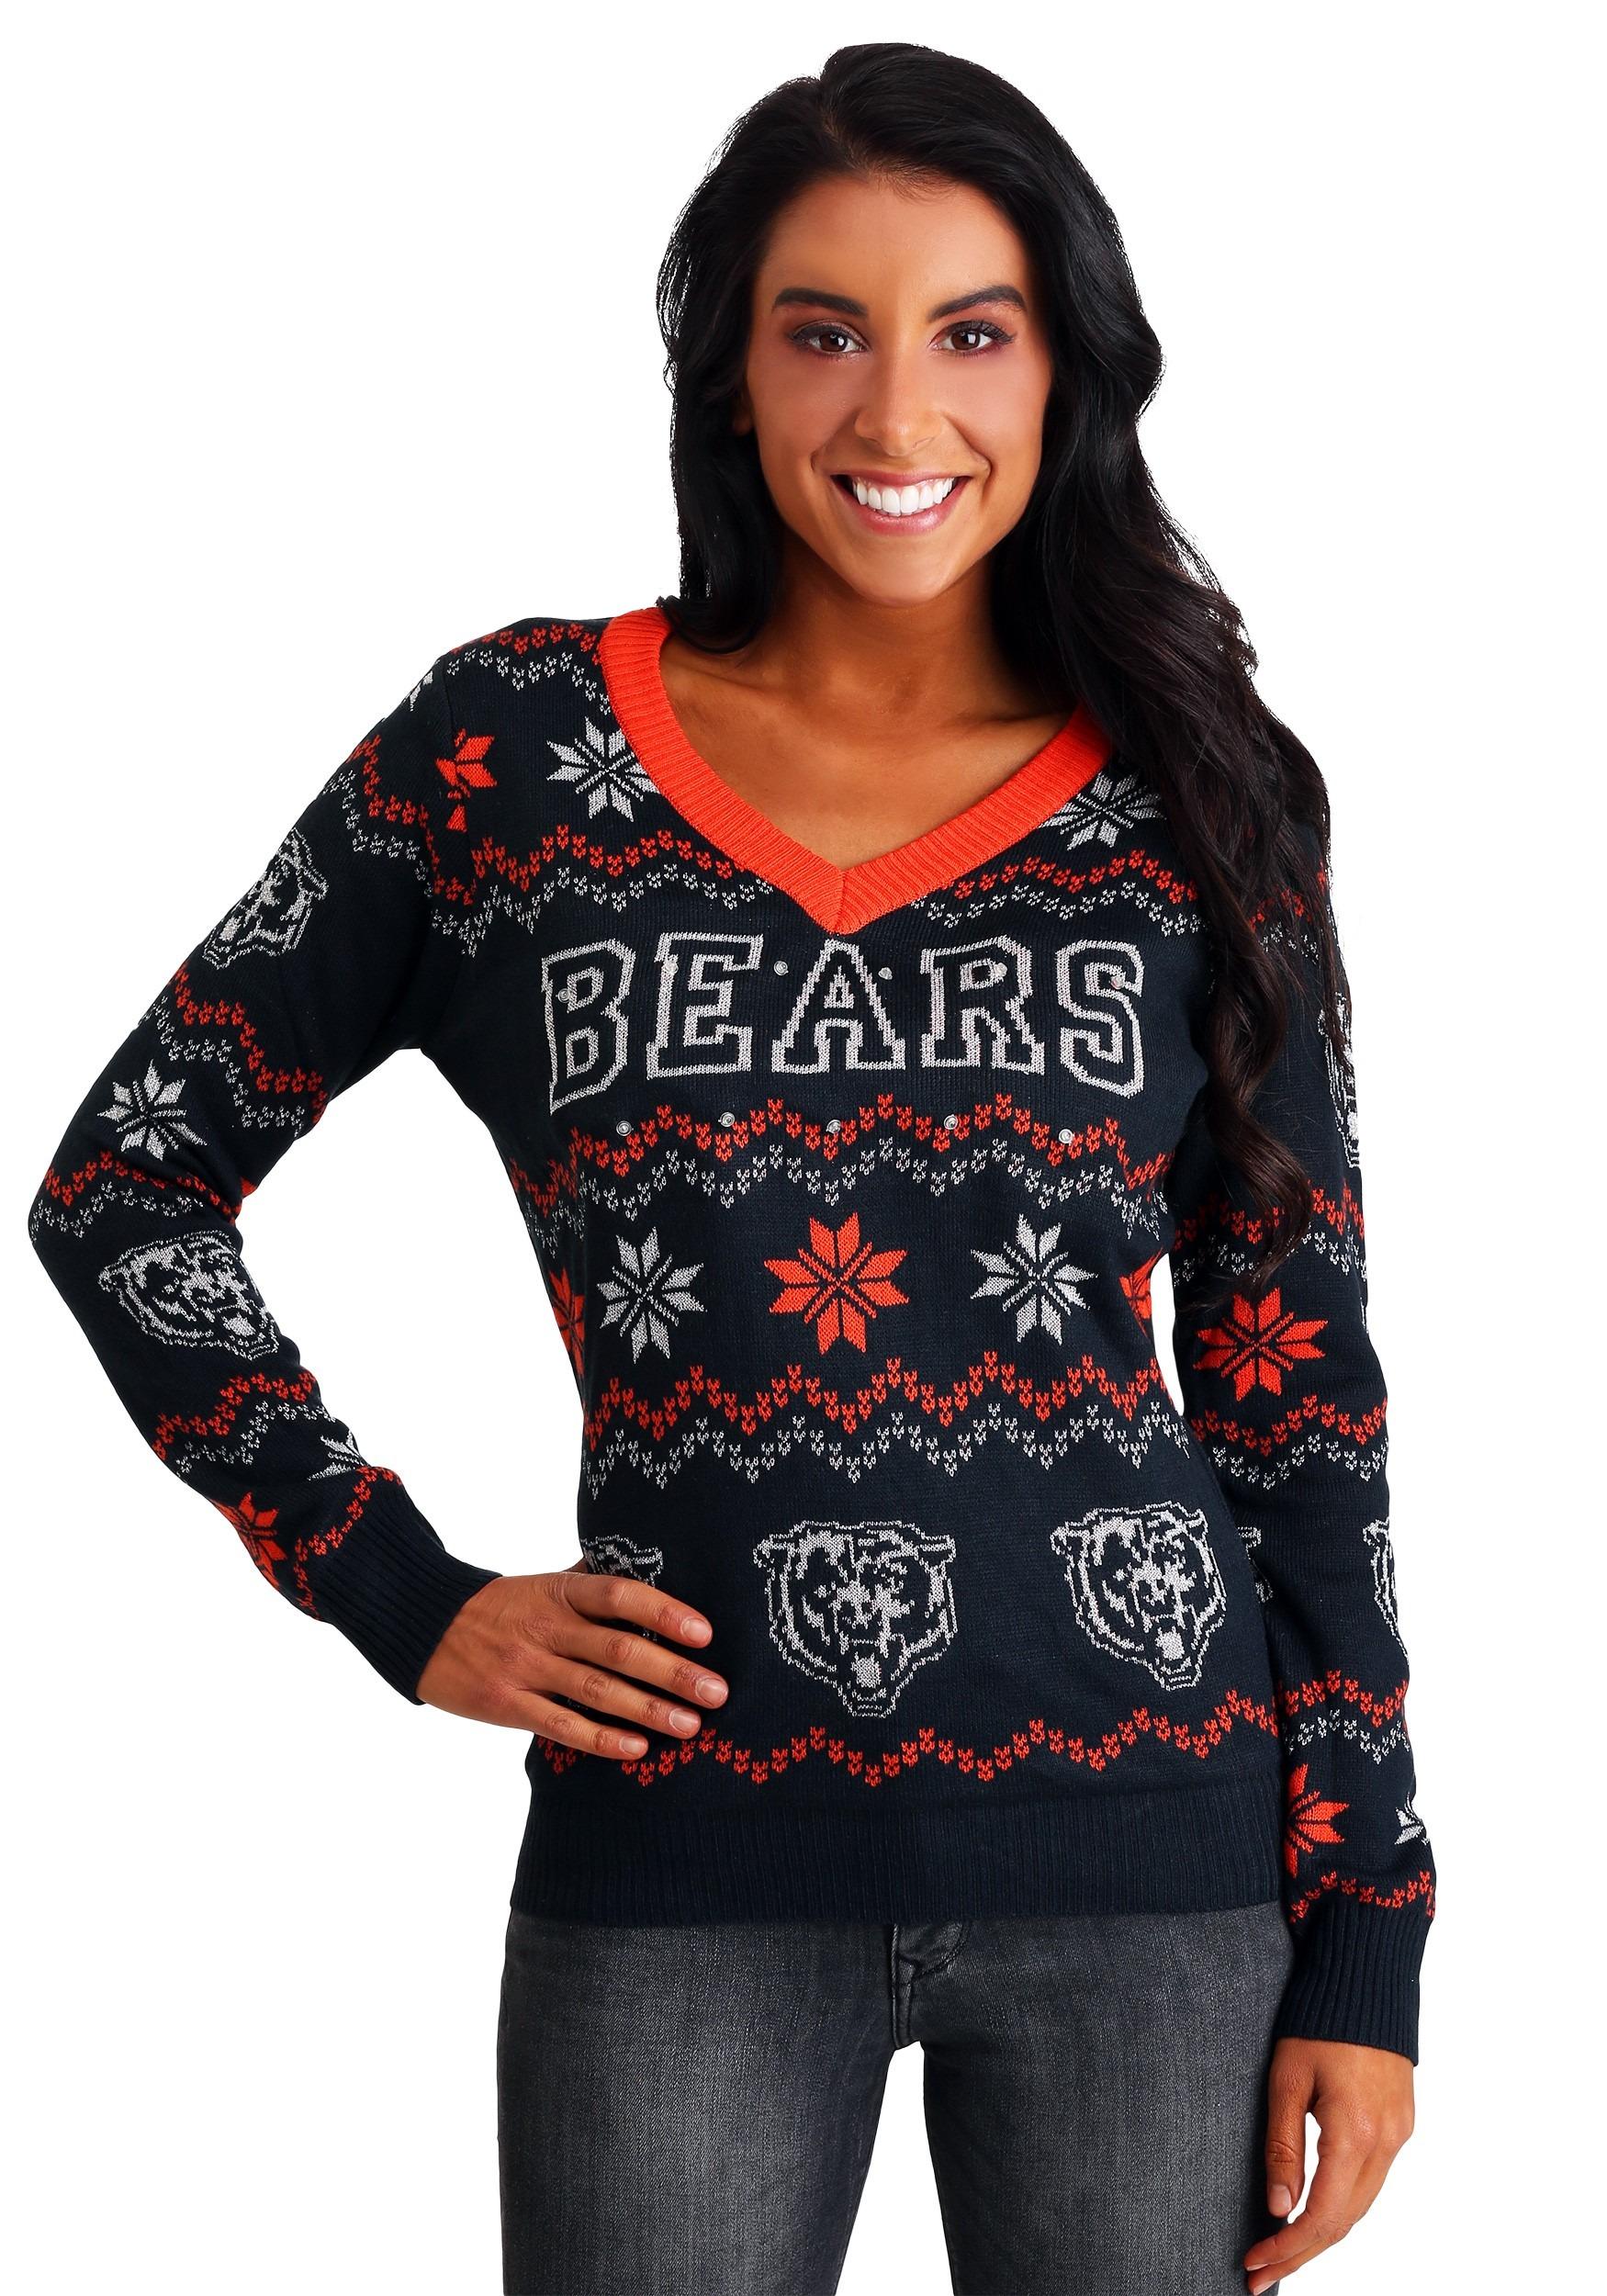 Light Up Christmas Sweater.Women S Chicago Bears Light Up V Neck Ugly Christmas Sweater